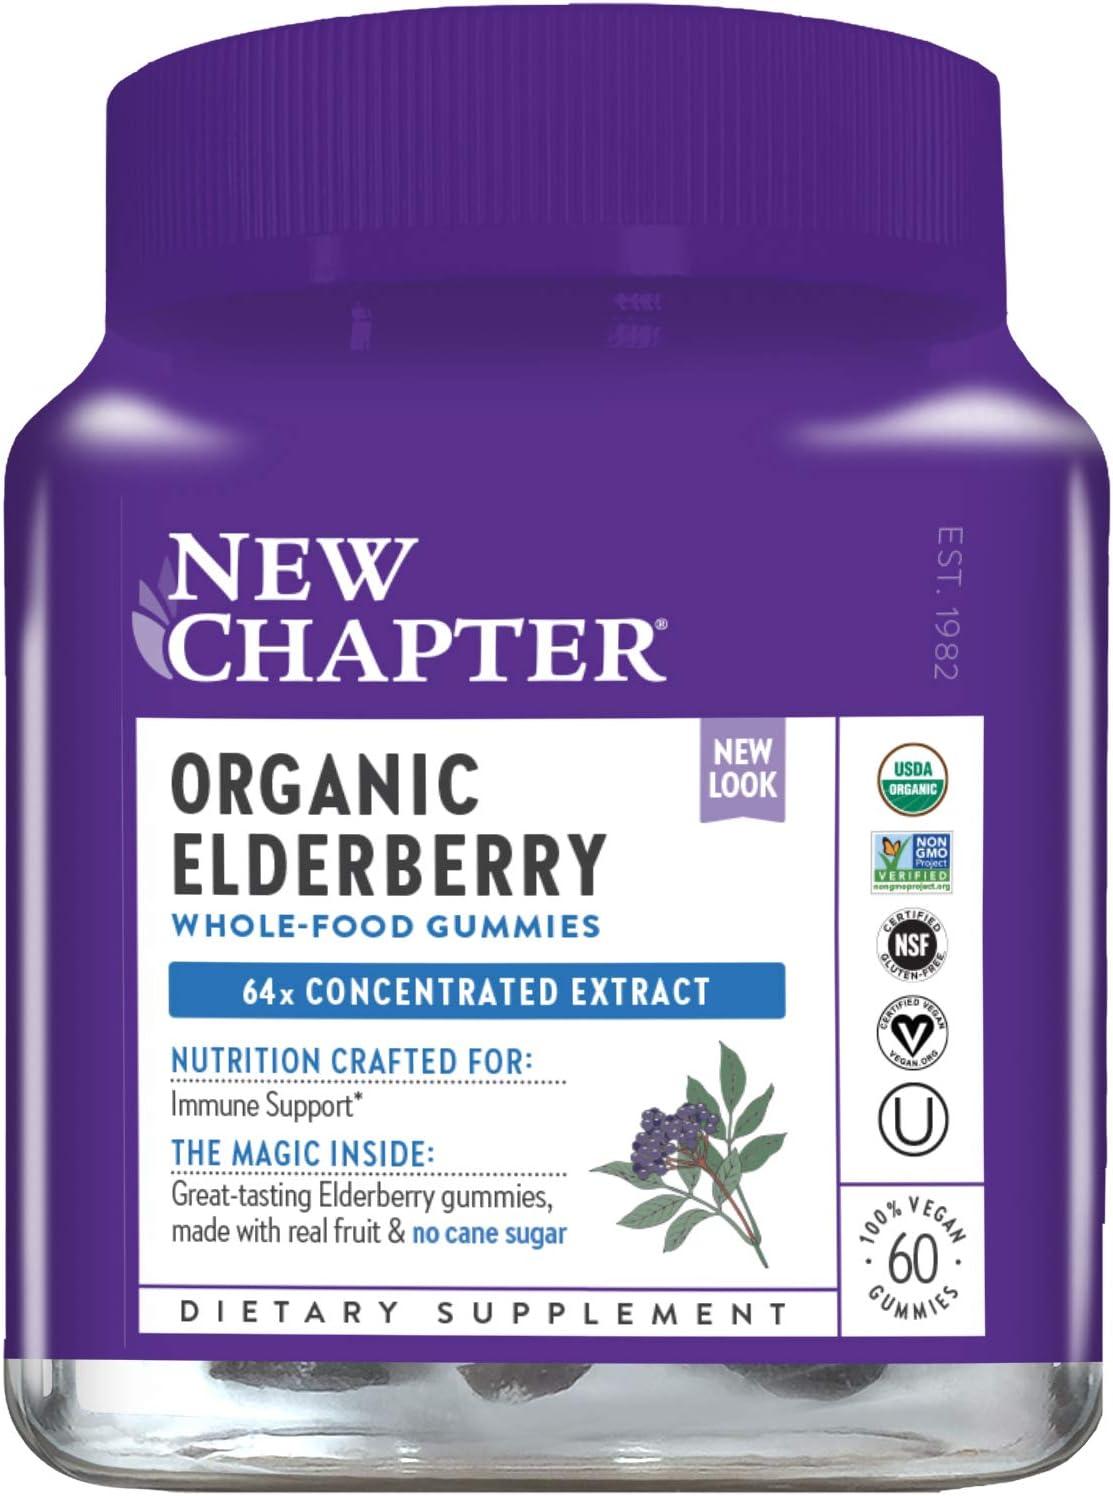 New Chapter Elderberry Gummies - Organic Elderberry Whole-Food Gummies for Immune Support - 60 ct